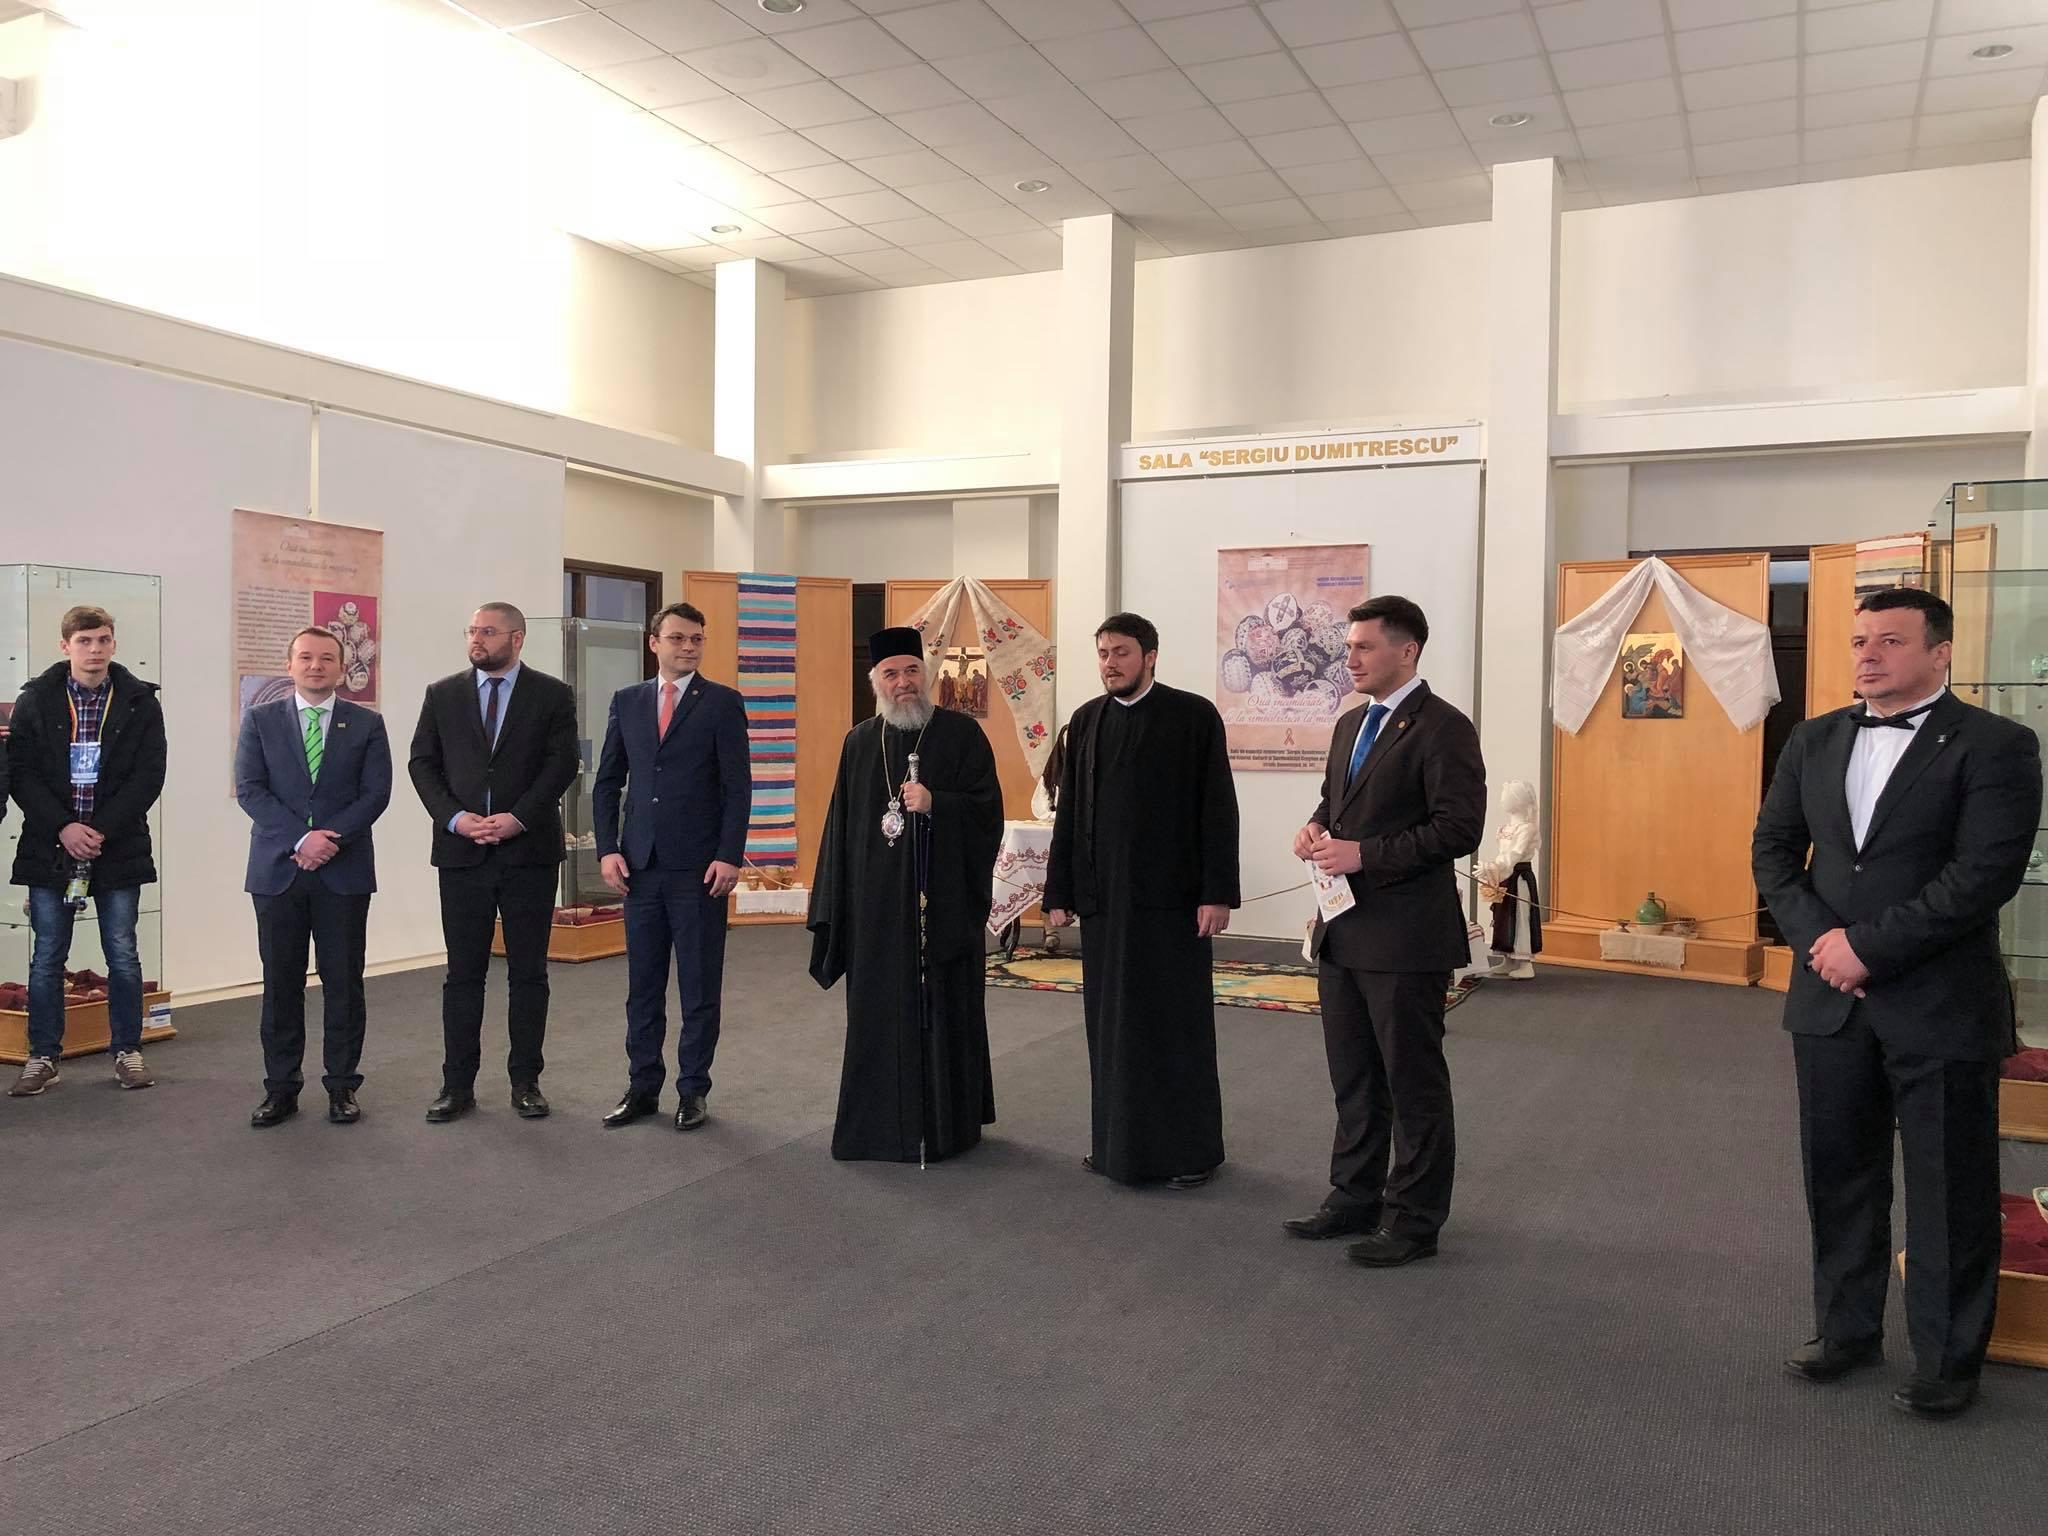 Constantin Codreanu Centenar Basarabia Unire